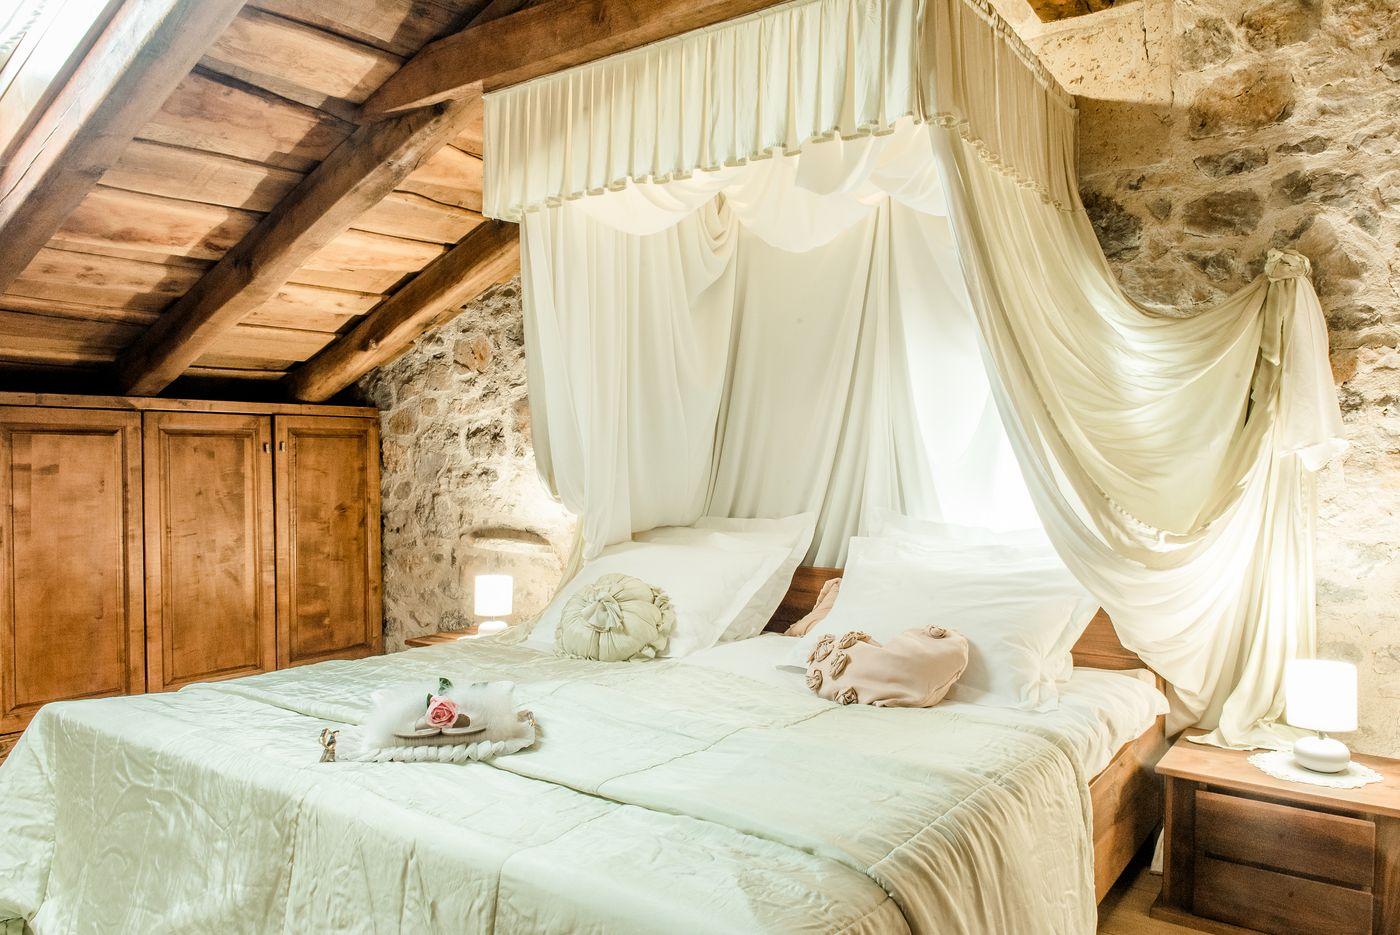 Master Bedroom Royal Suite Asa Residence Private Villa Kras Slovenia